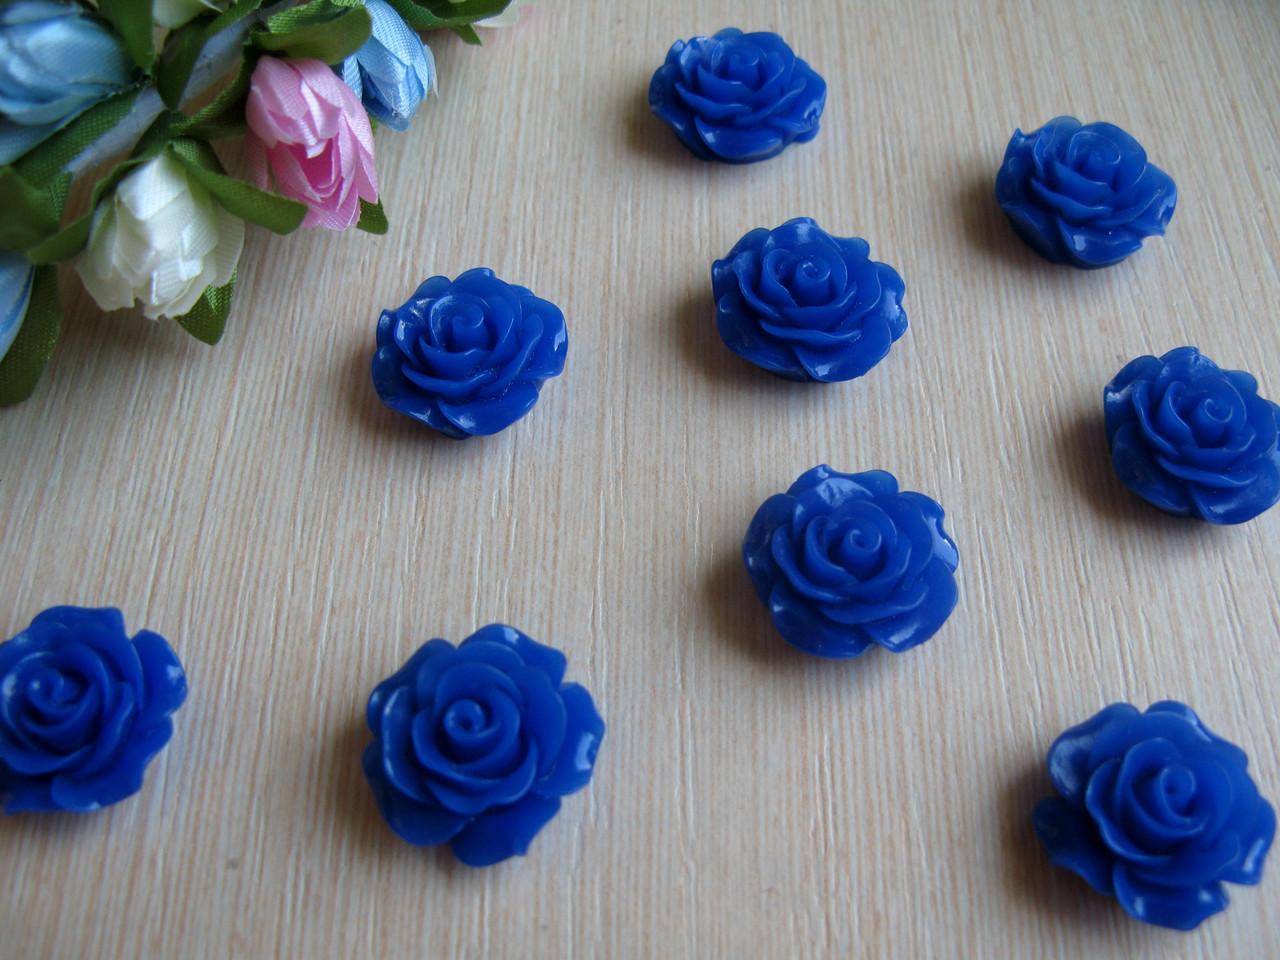 Серединка акриловая - Синяя роза малышка р-р - 9 мм цена 7.5 грн - 10 шт